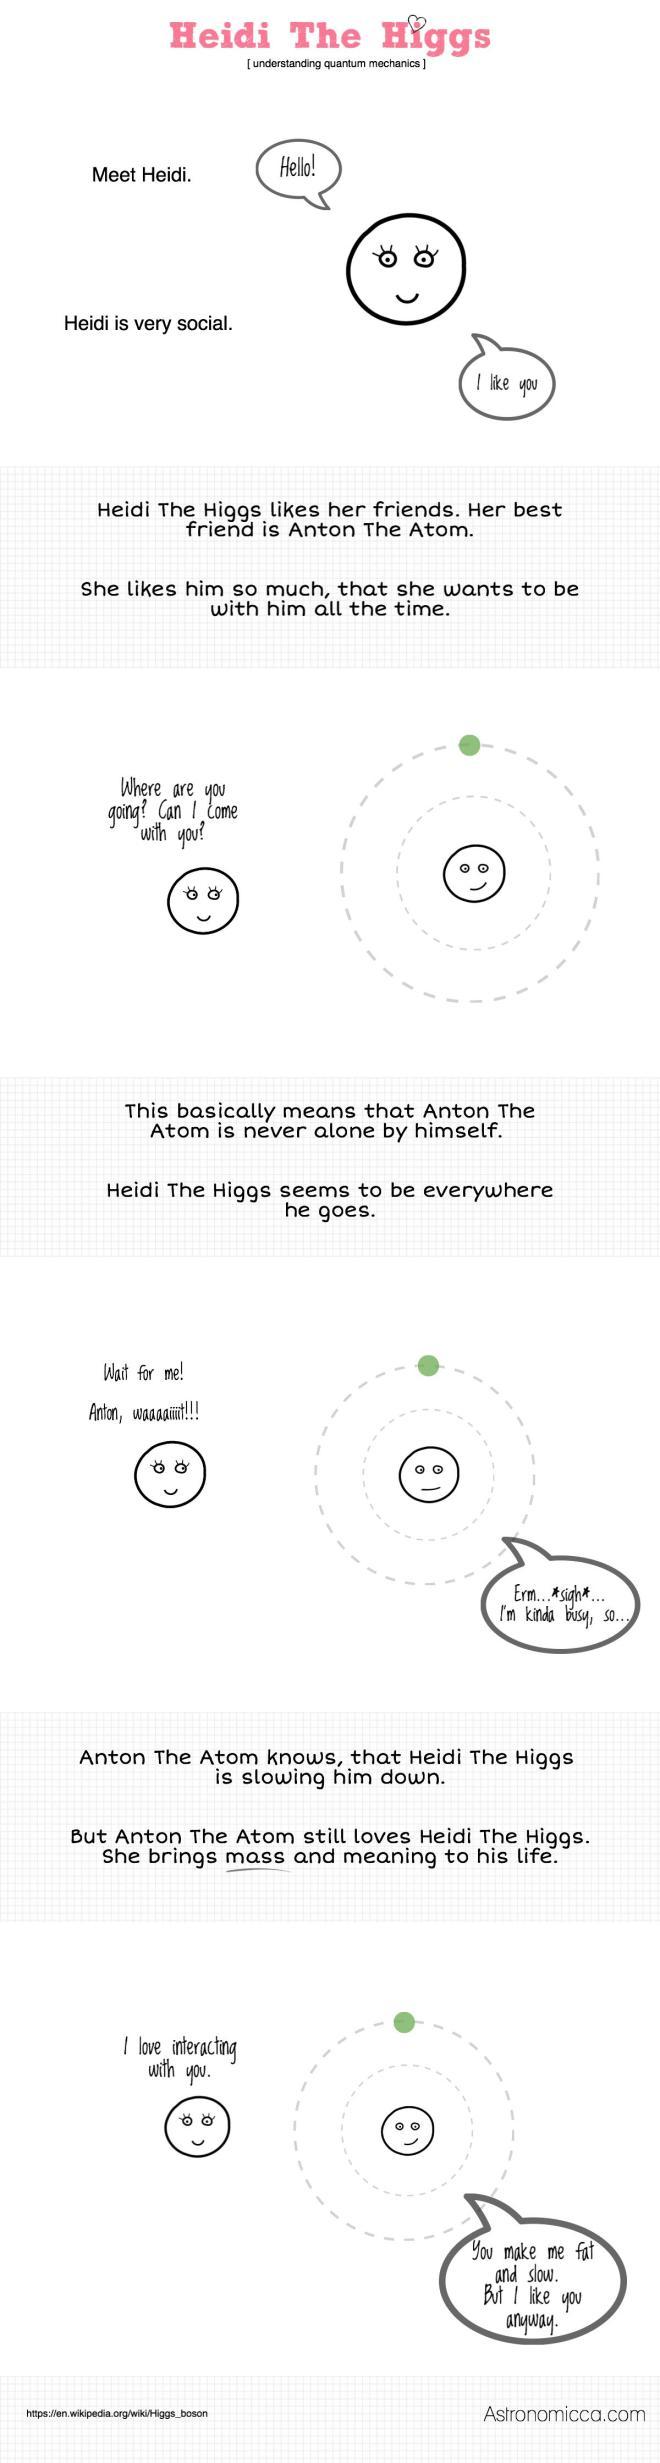 heidi-the-higgs